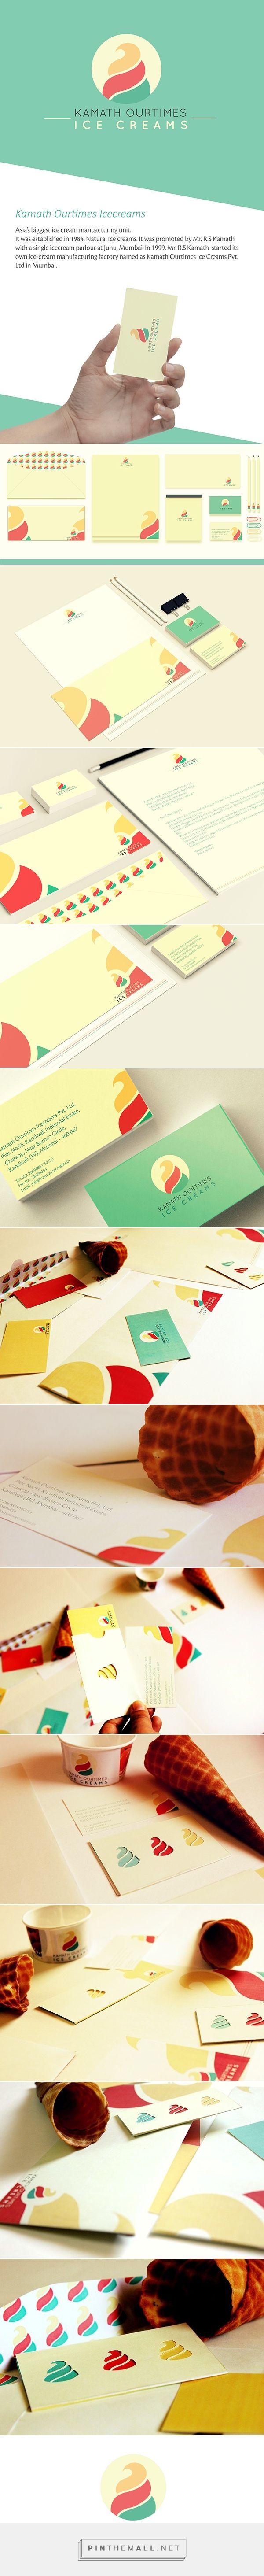 Kamath Ourtimes Ice Cream Branding by Meroo Seth   Fivestar Branding – Design and Branding Agency & Inspiration Gallery